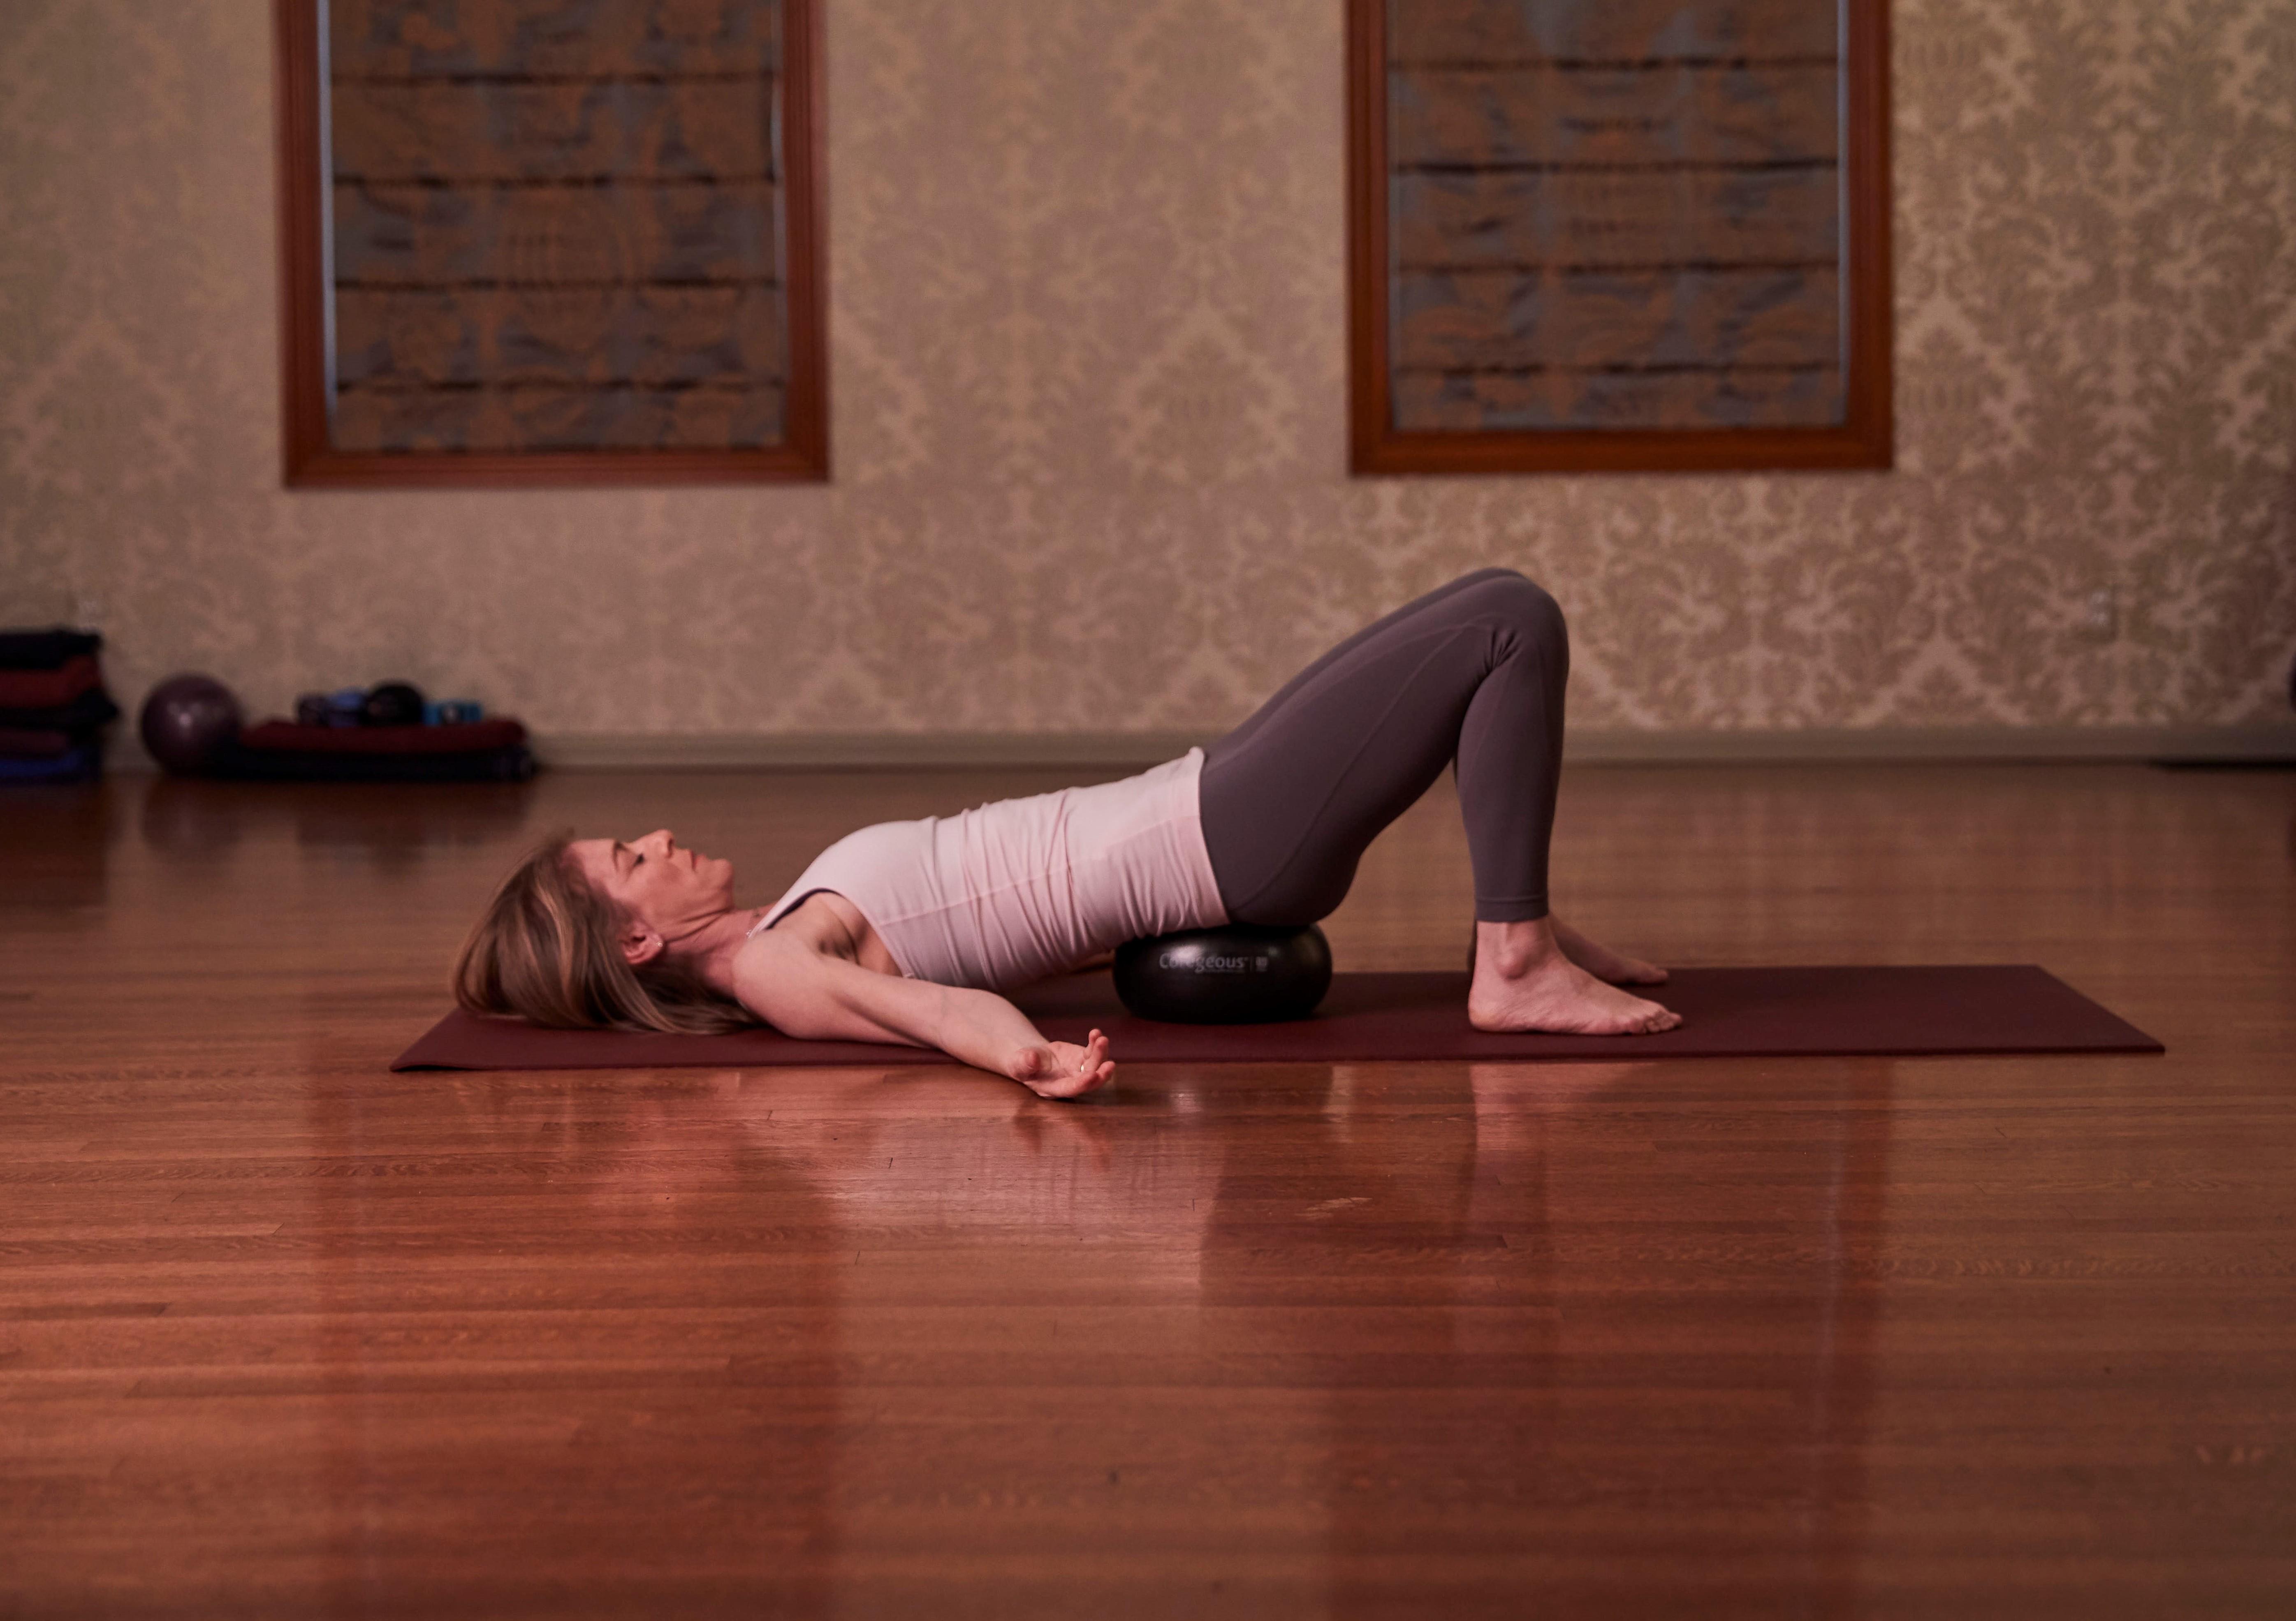 Jill Miller, female yogi, in Viapreeta Karani Mudra on Coregeous Ball